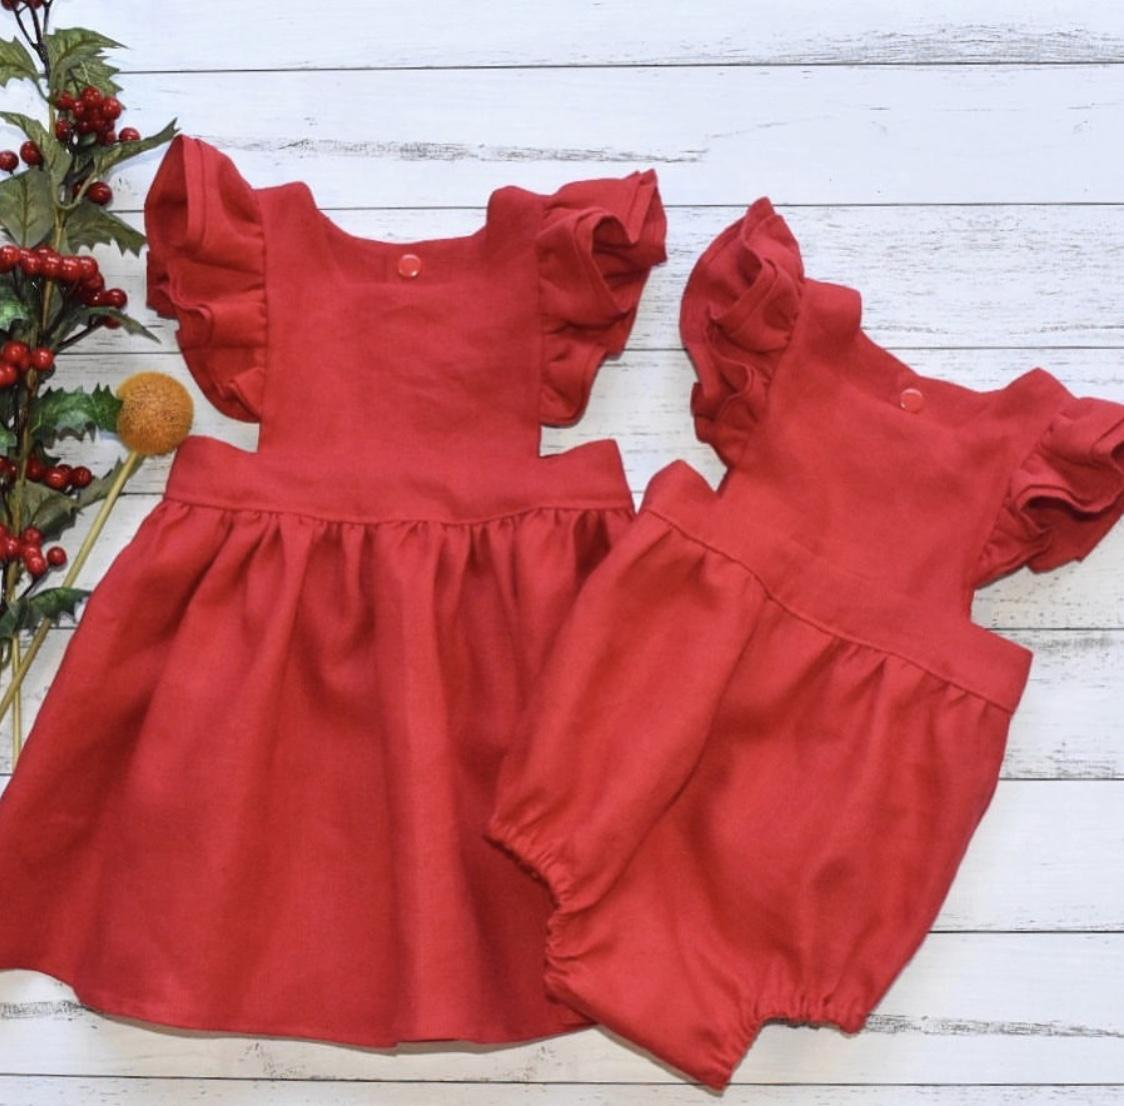 100% linen dress/romper